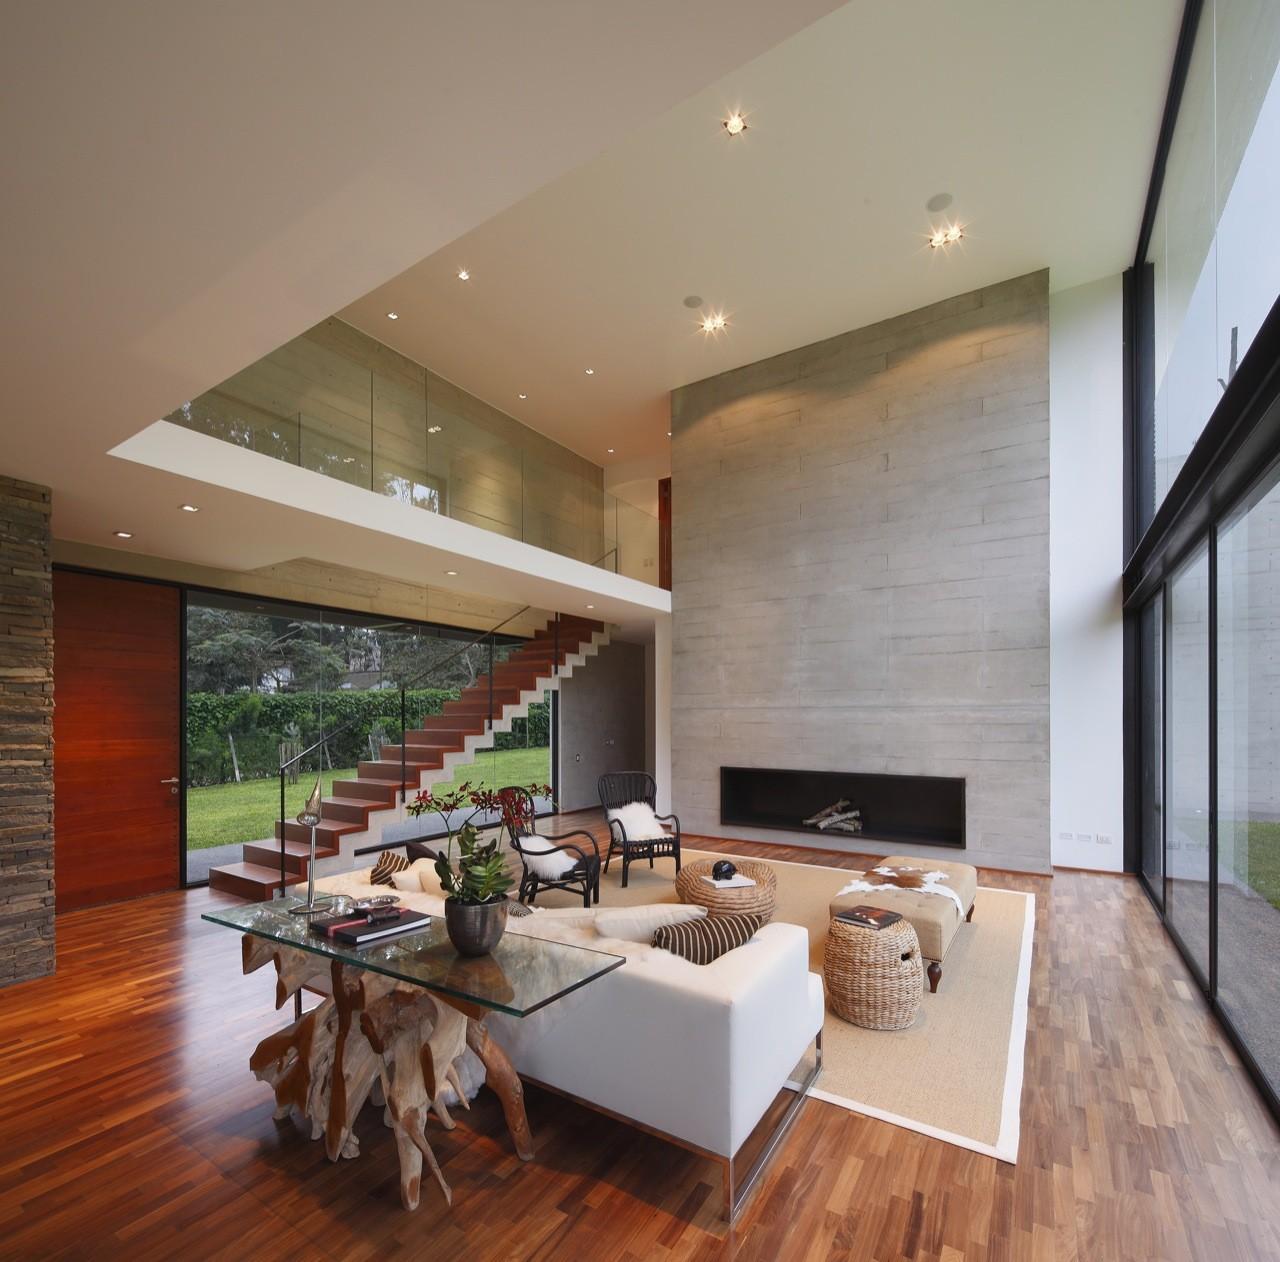 House b2  Jaime Ortiz de Zevallos  ArchDaily